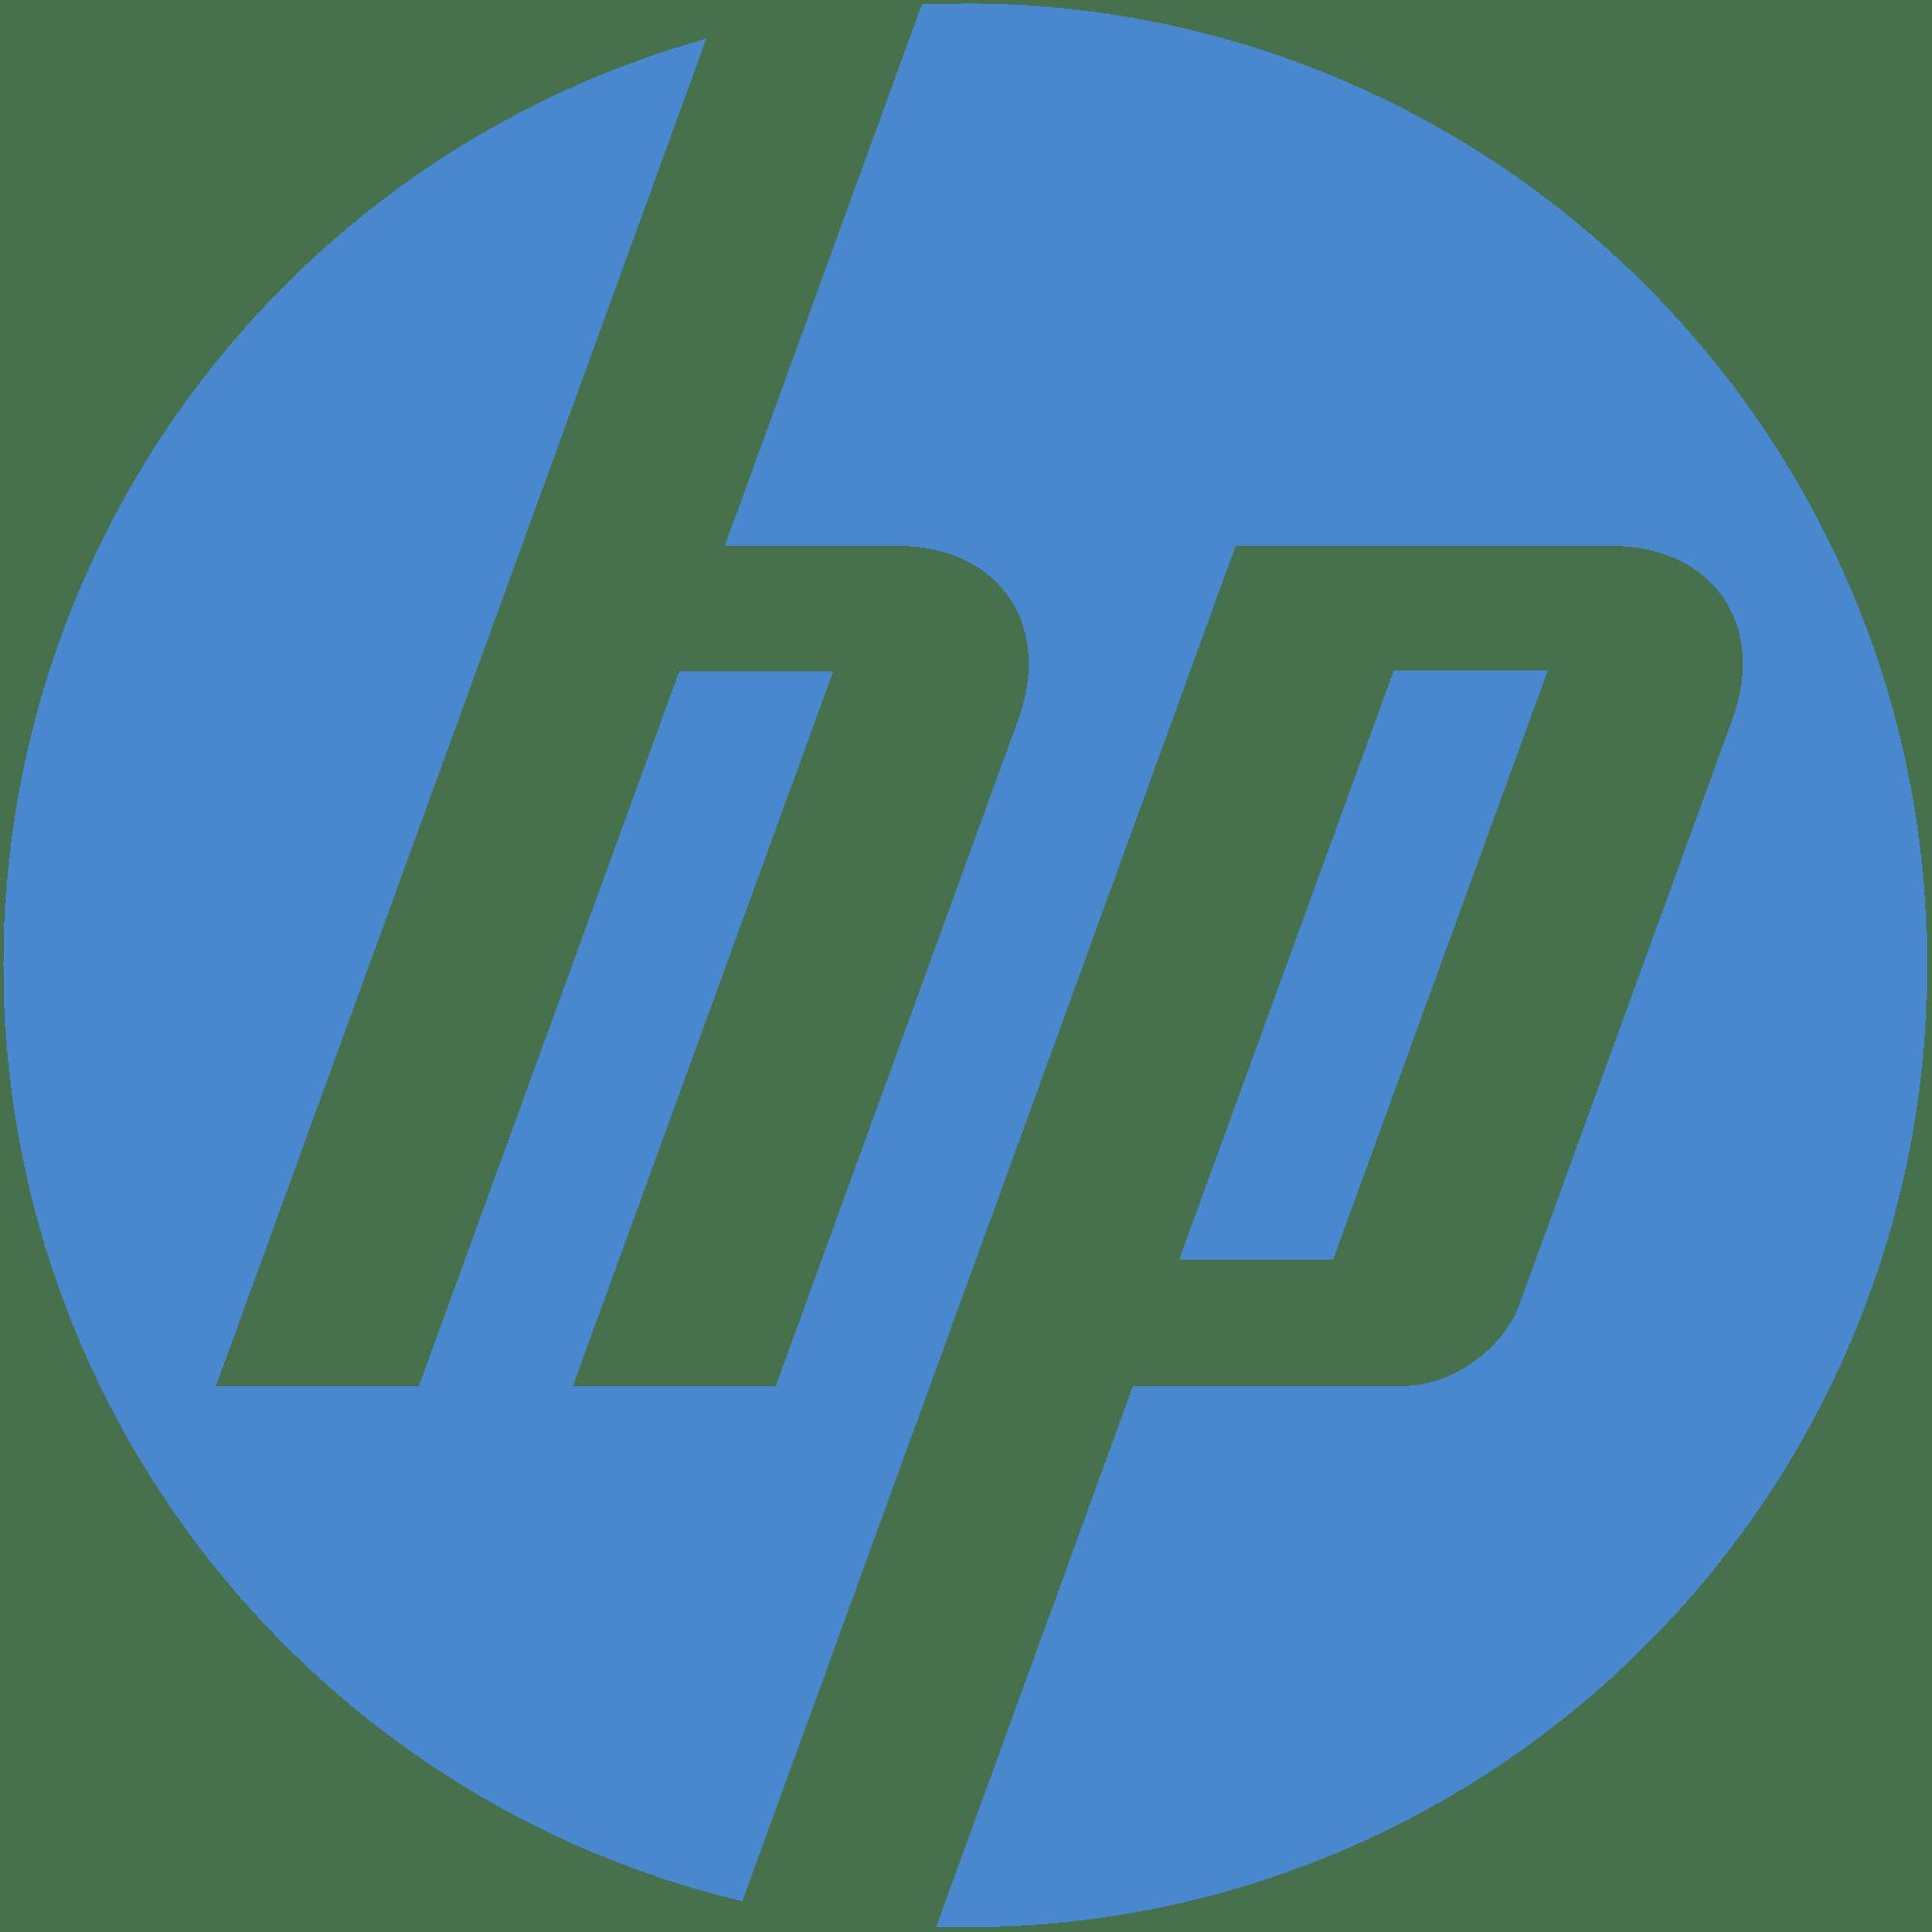 HP Pavilion dv4-2160us  Notebook PC drivers